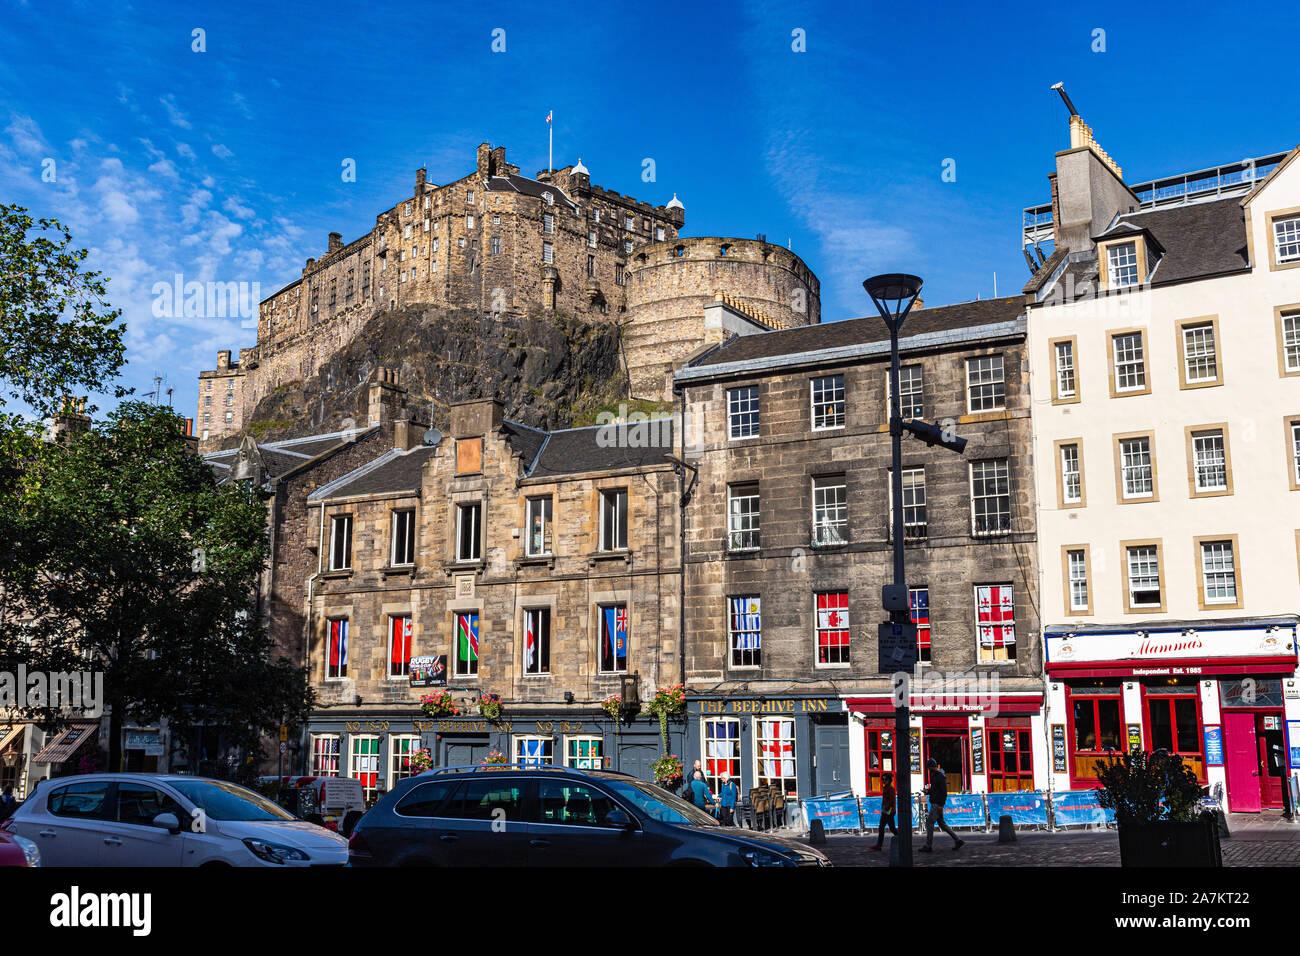 View of Edinburgh Castle Above Historic Buildings in the Grassmarket With Blue Sky. Edinburgh, Scotland. Stock Photo